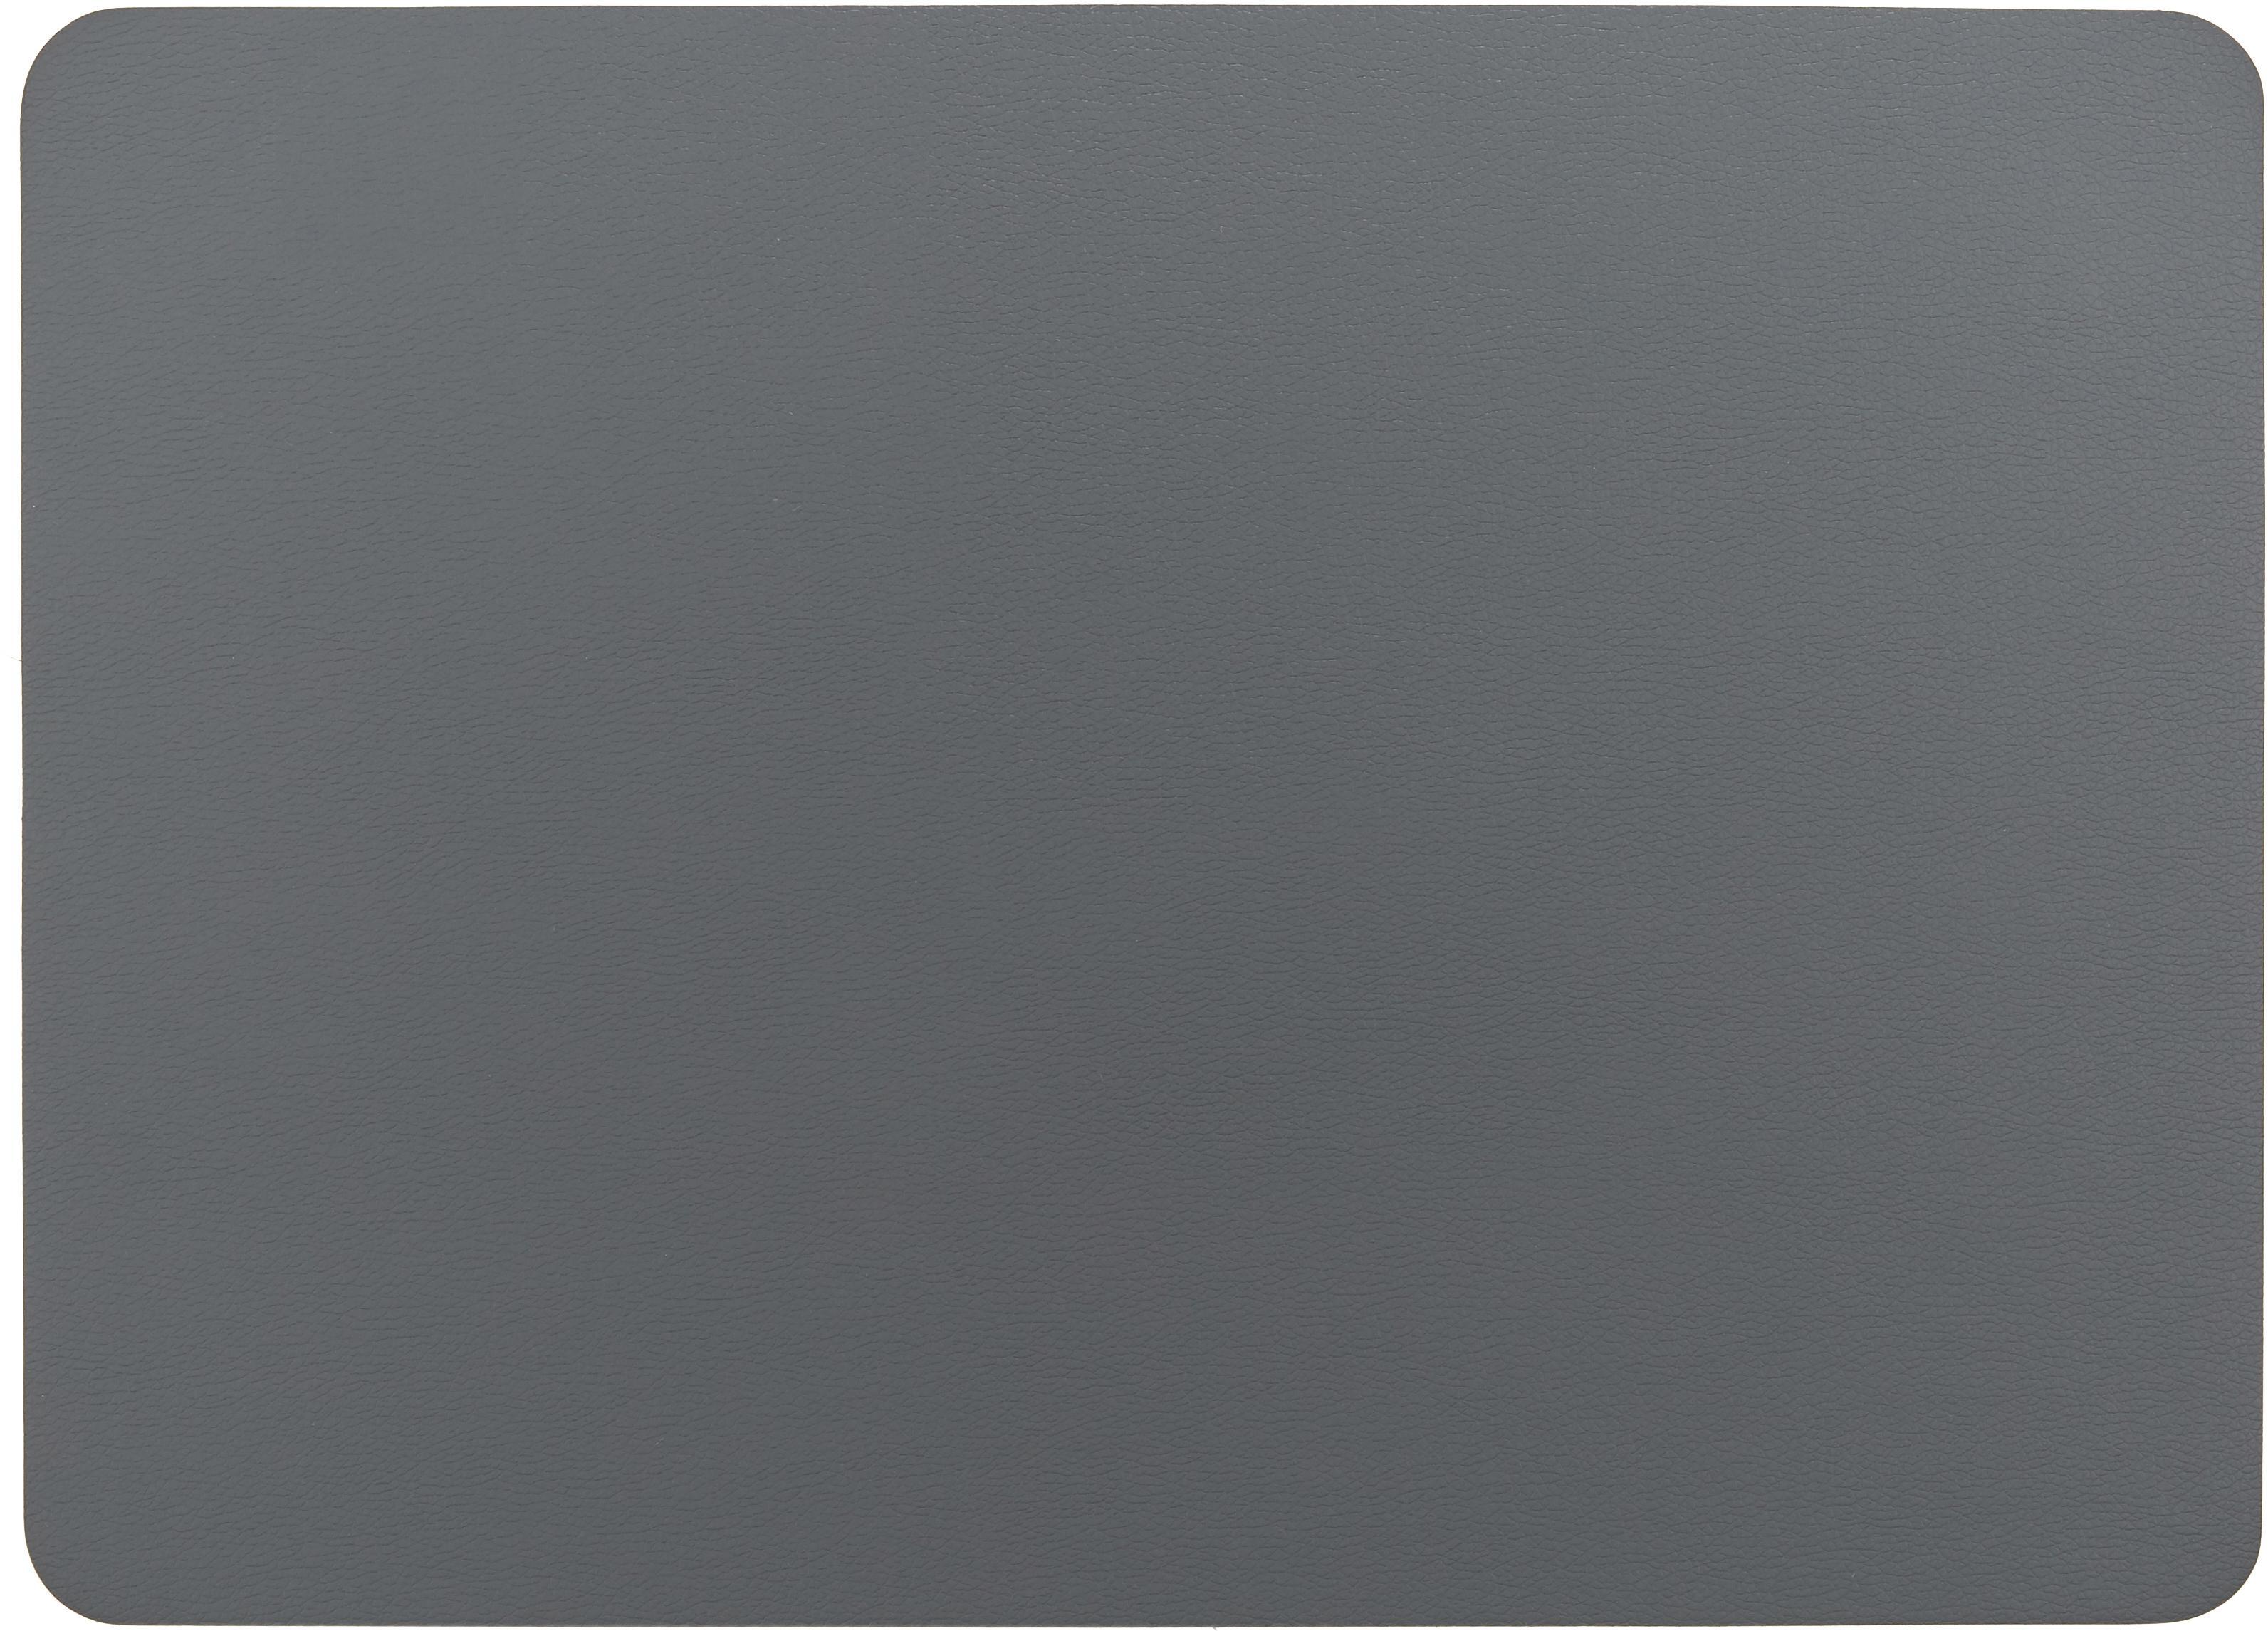 Kunstleder-Tischsets Pik, 2 Stück, Kunstleder (PVC), Anthrazit, 33 x 46 cm